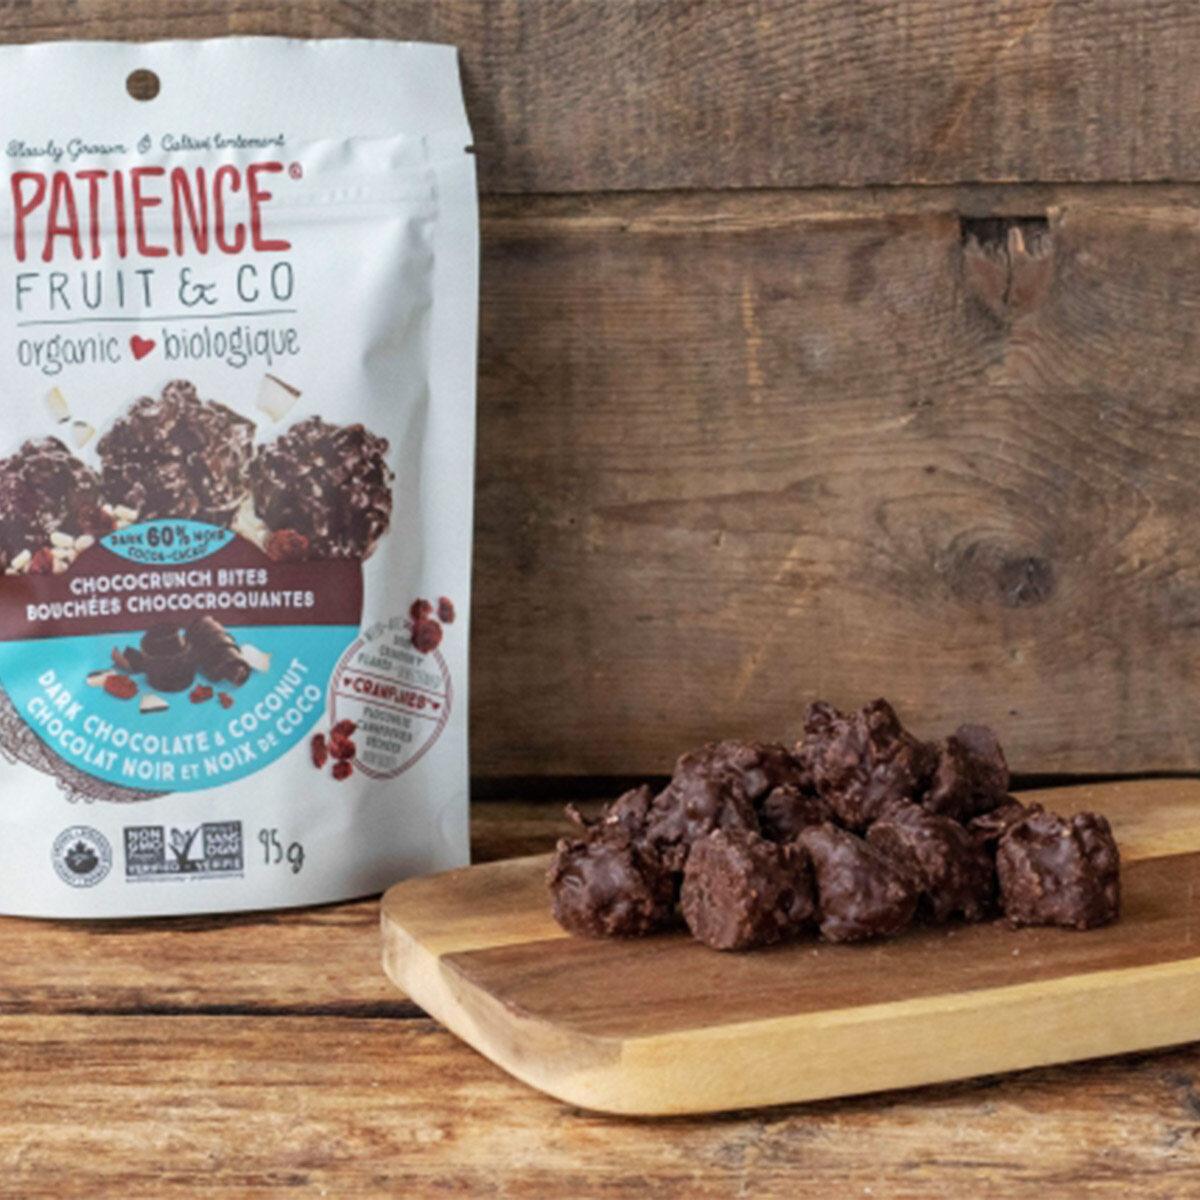 Patience Organic Chococrunch Bites Dark Chocolate & Coconut 95g 有机黑巧克力+烤椰子片(EXP31/8/2021)